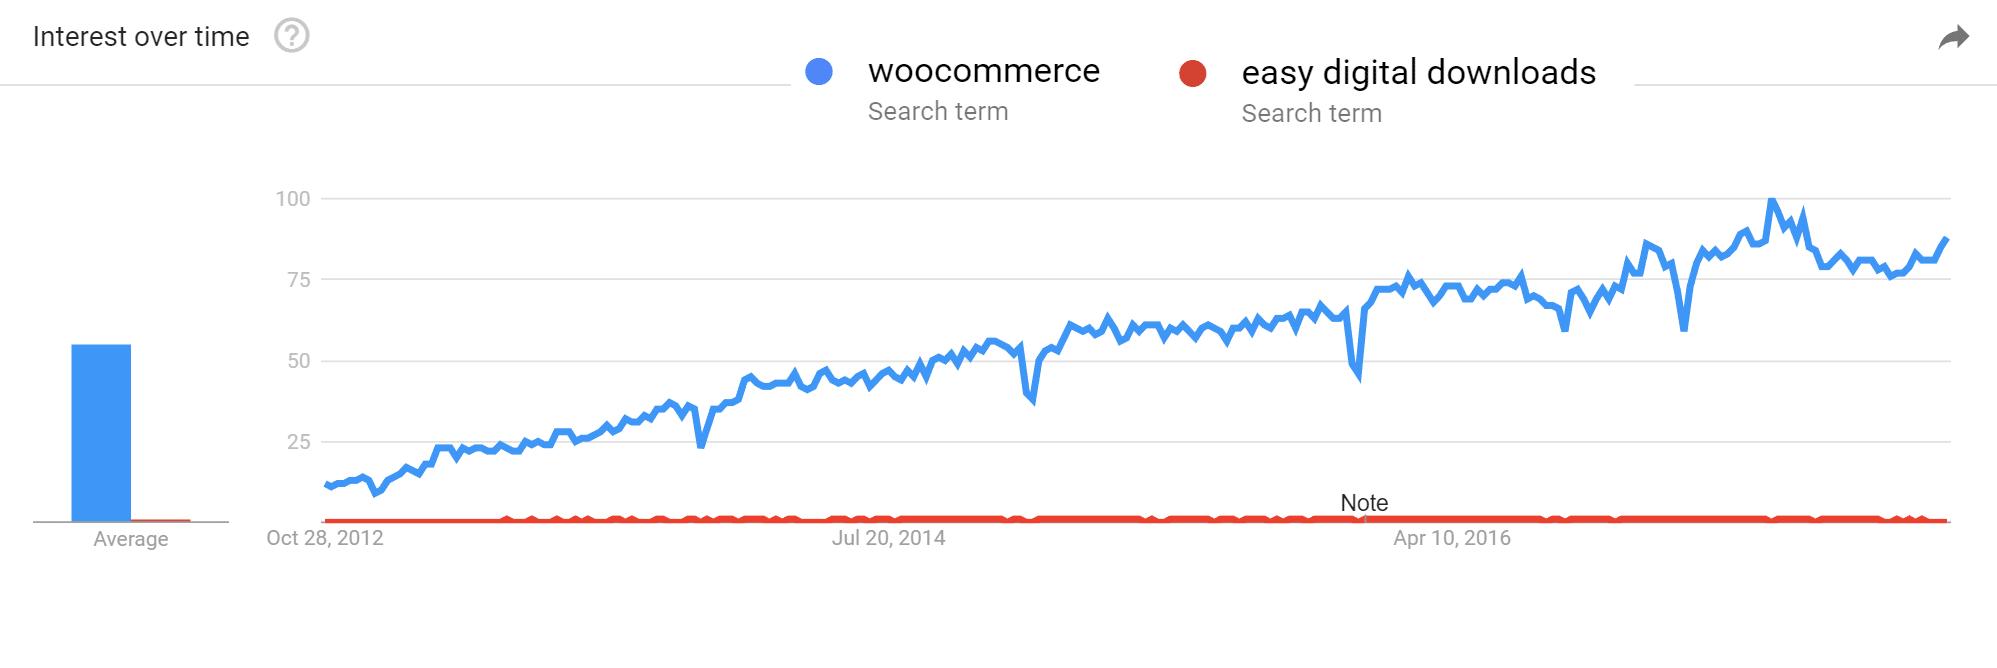 WooCommerce y EDD Google Trends